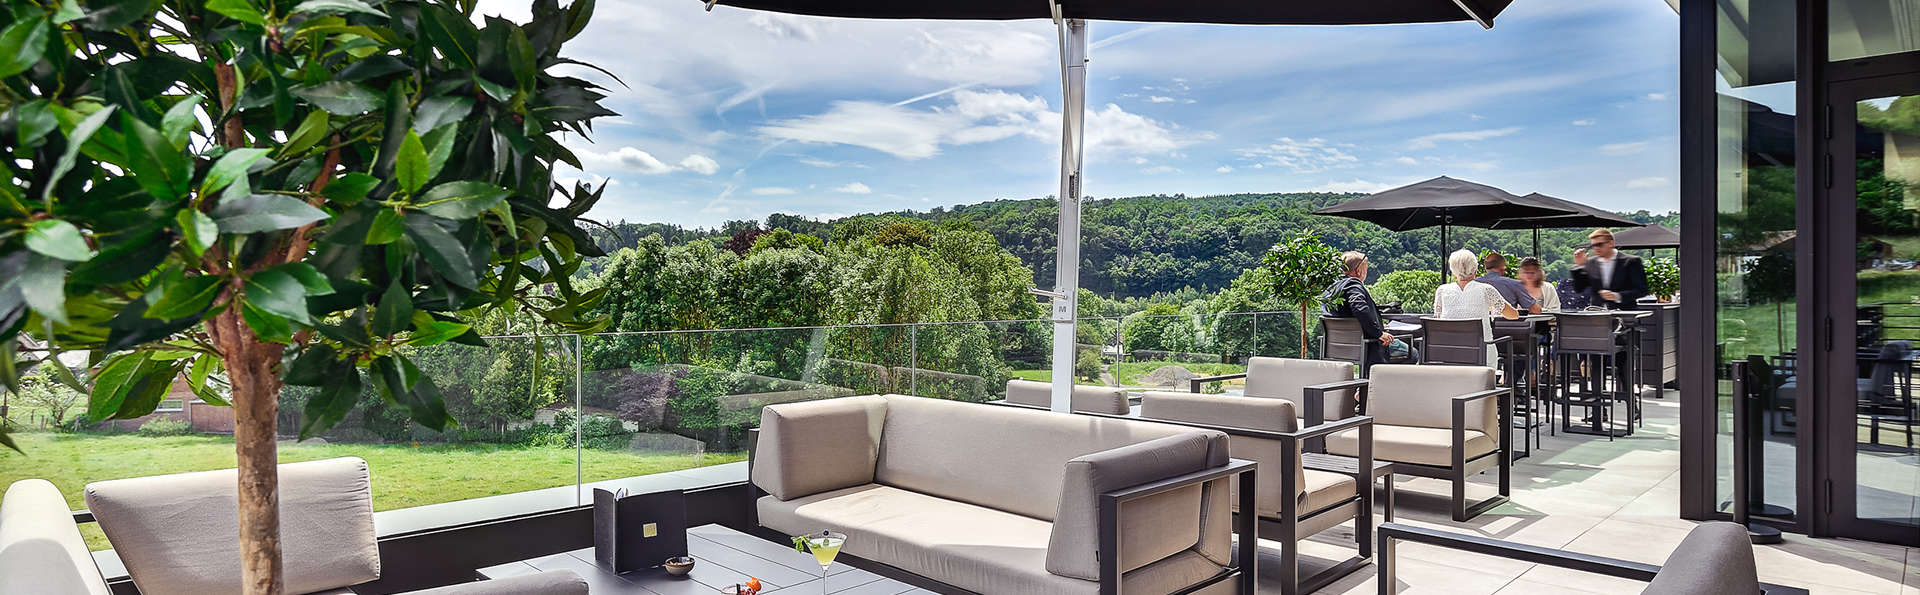 R hotel experiences - EDIT_NEW_terrace.jpg